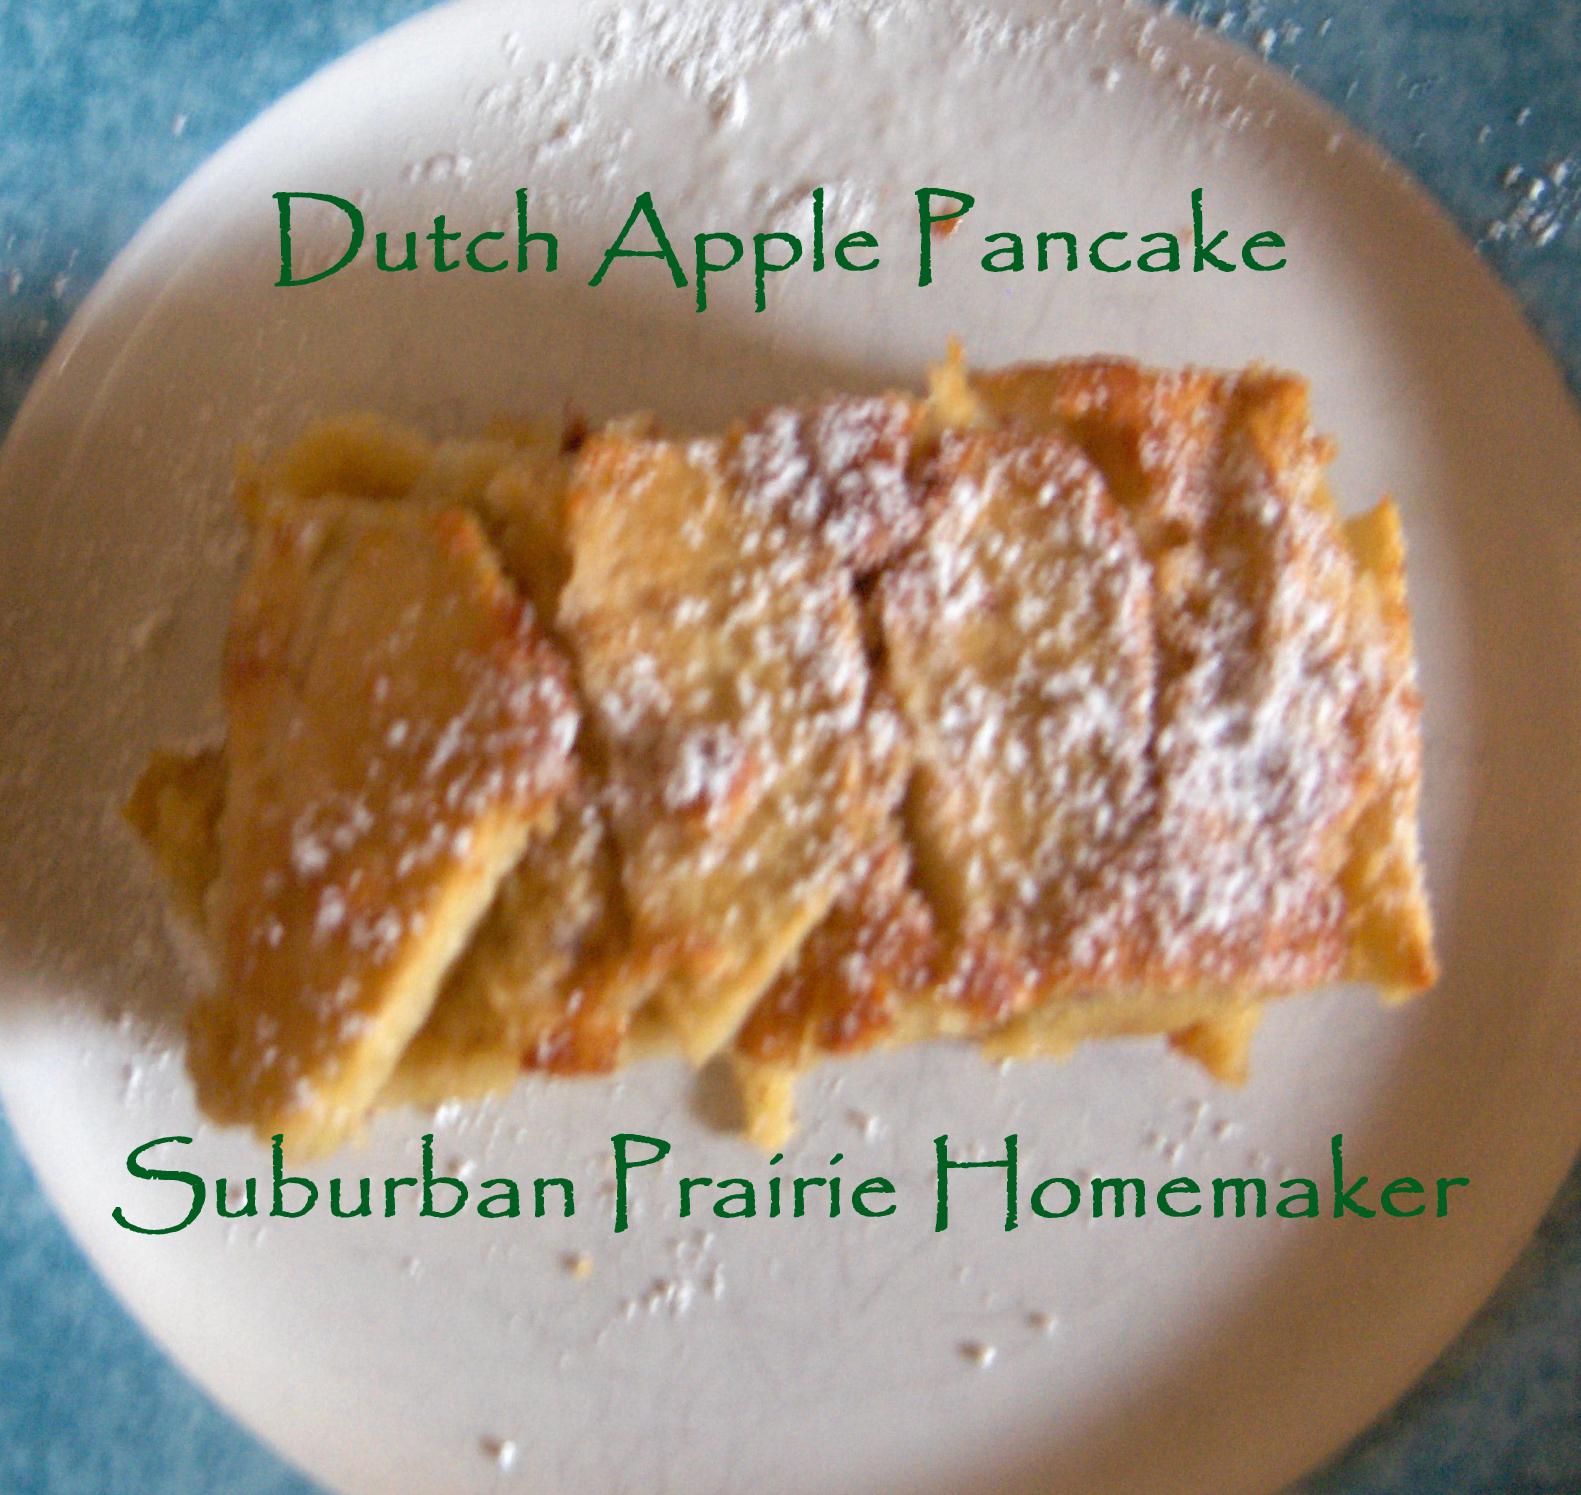 Suburban Prairie Homemaker: Gluten Free Dutch Apple Pancake Recipe